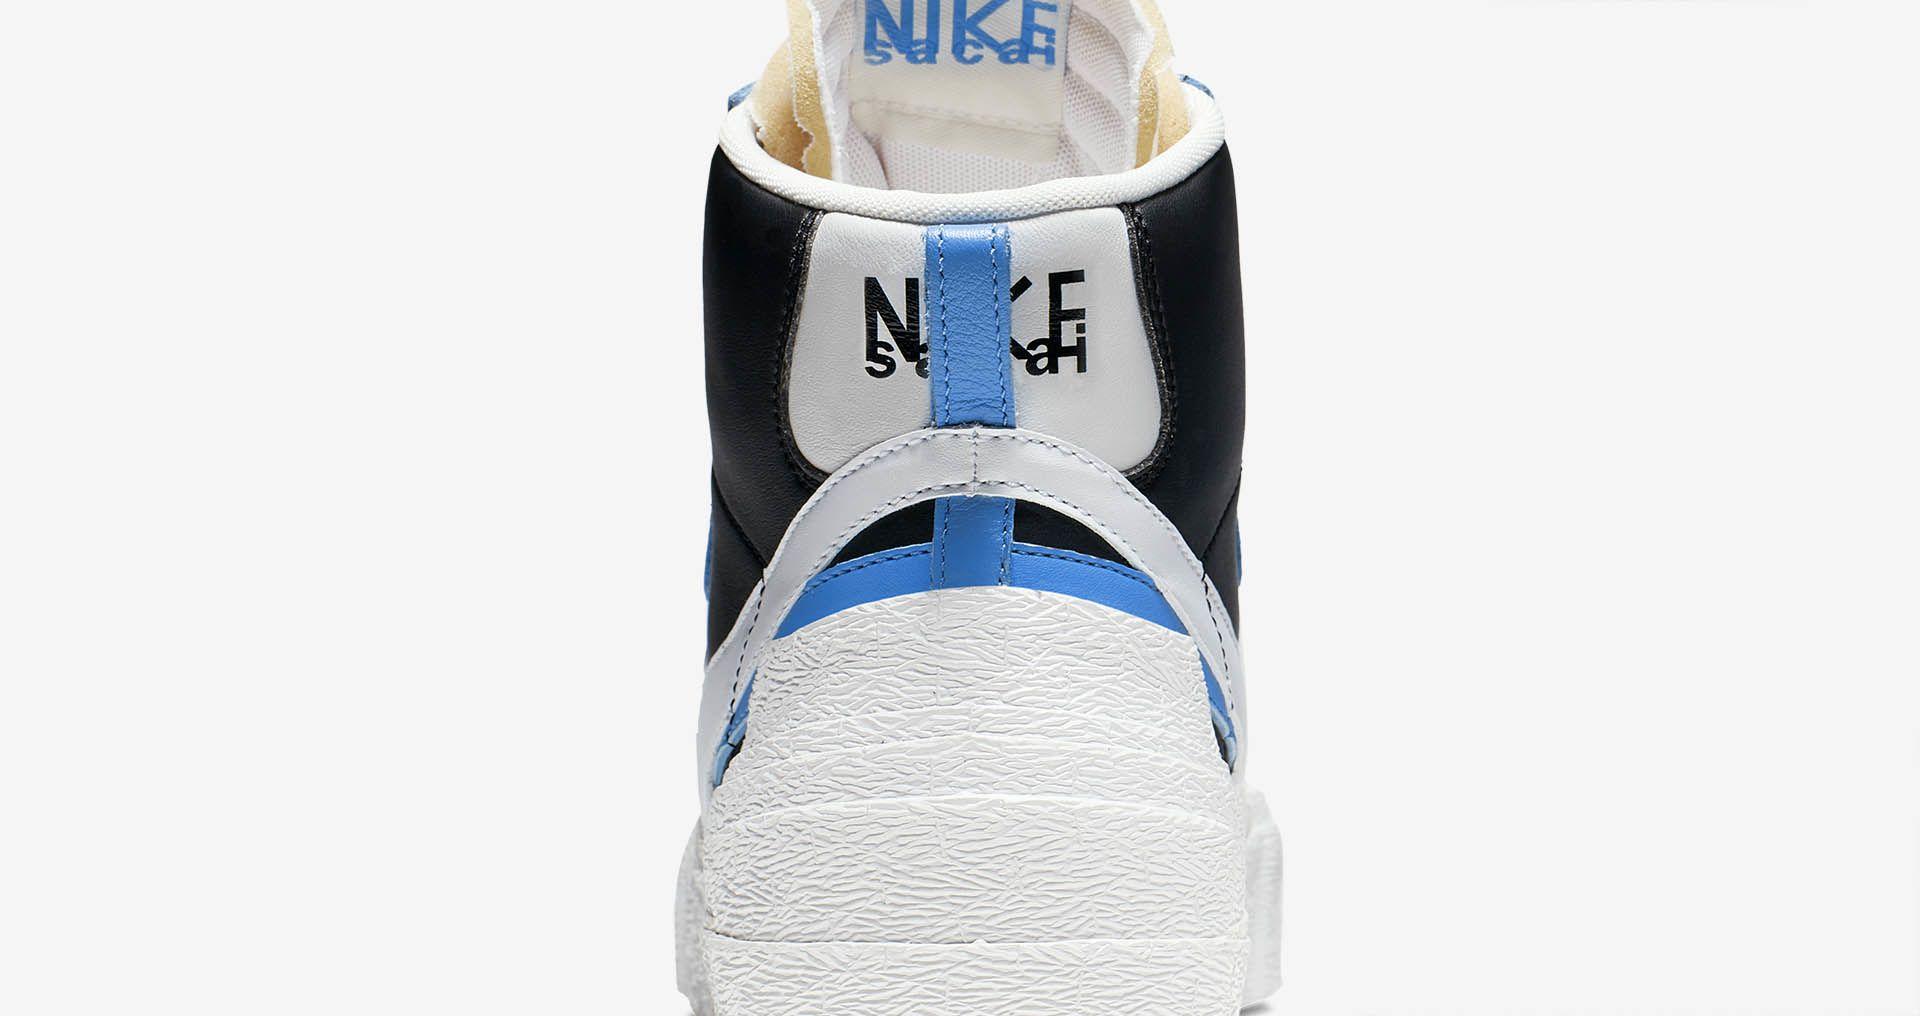 10-nike-blazer-mid-sacai-black-blue-bv0072-001